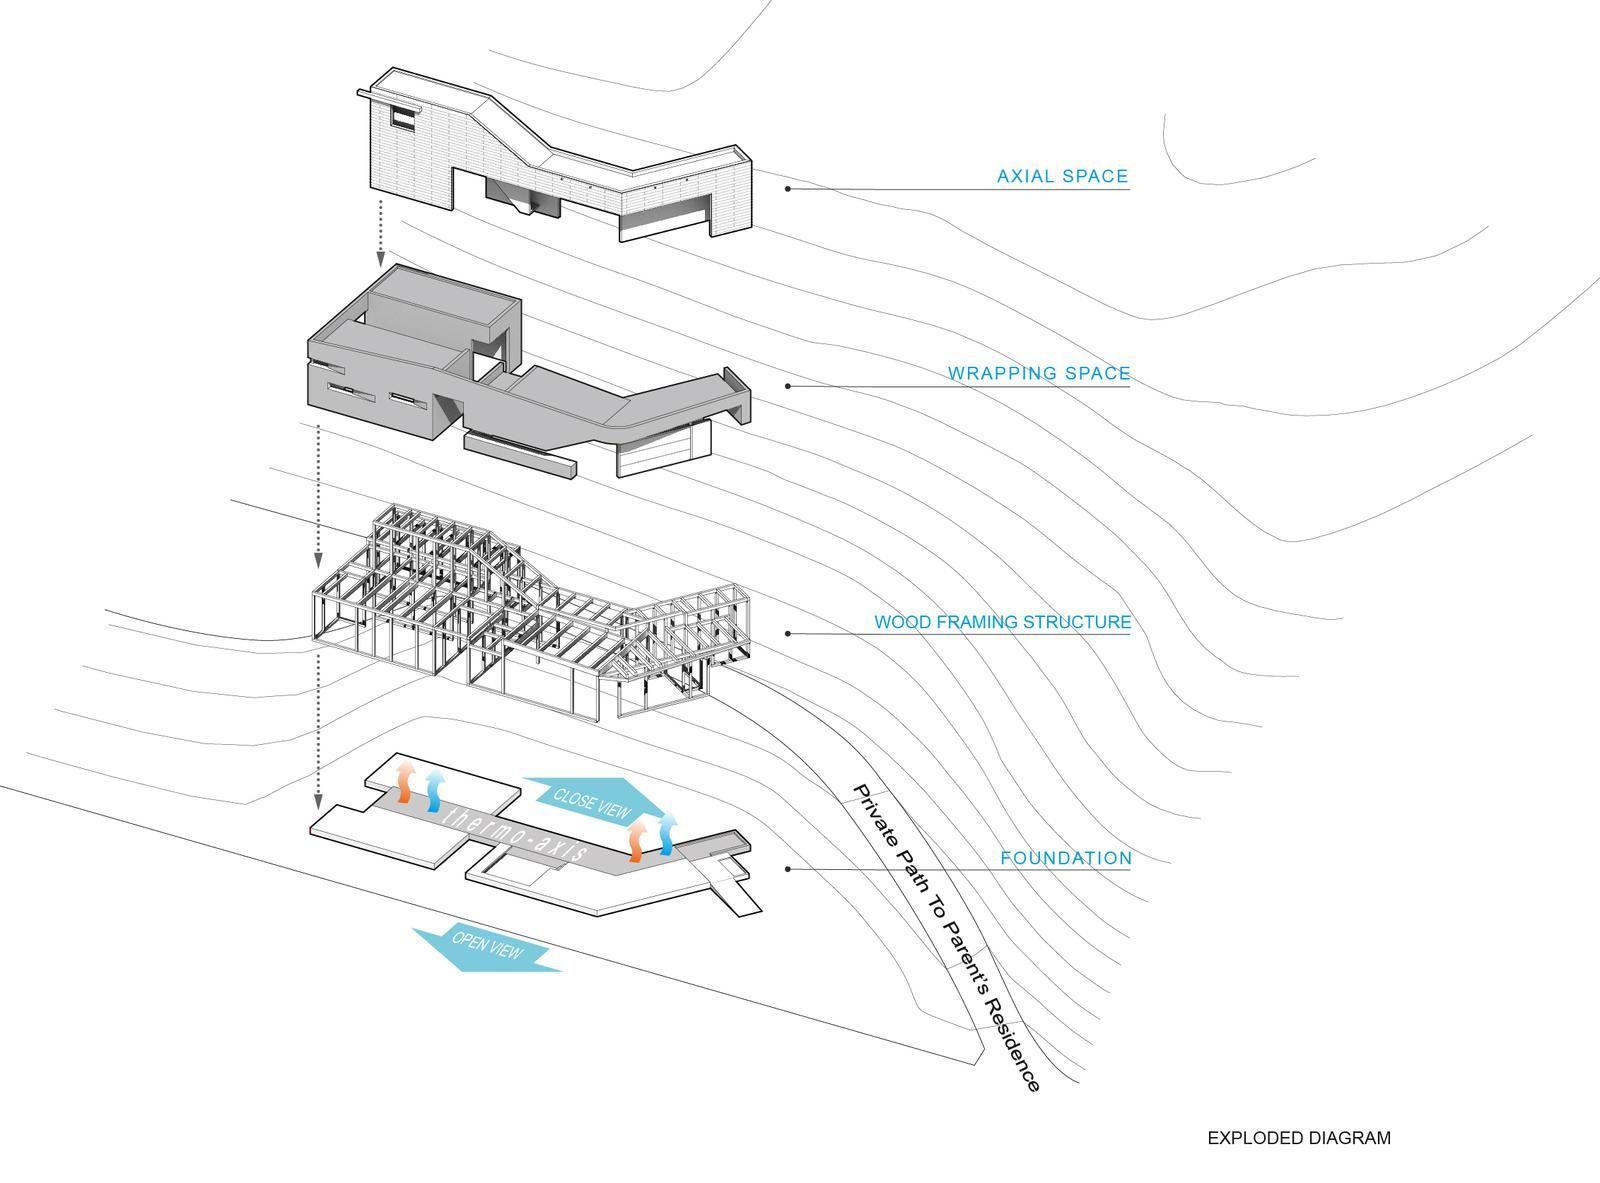 exploded axon diagram 220v 3 phase motor wiring axonometric e house architecture